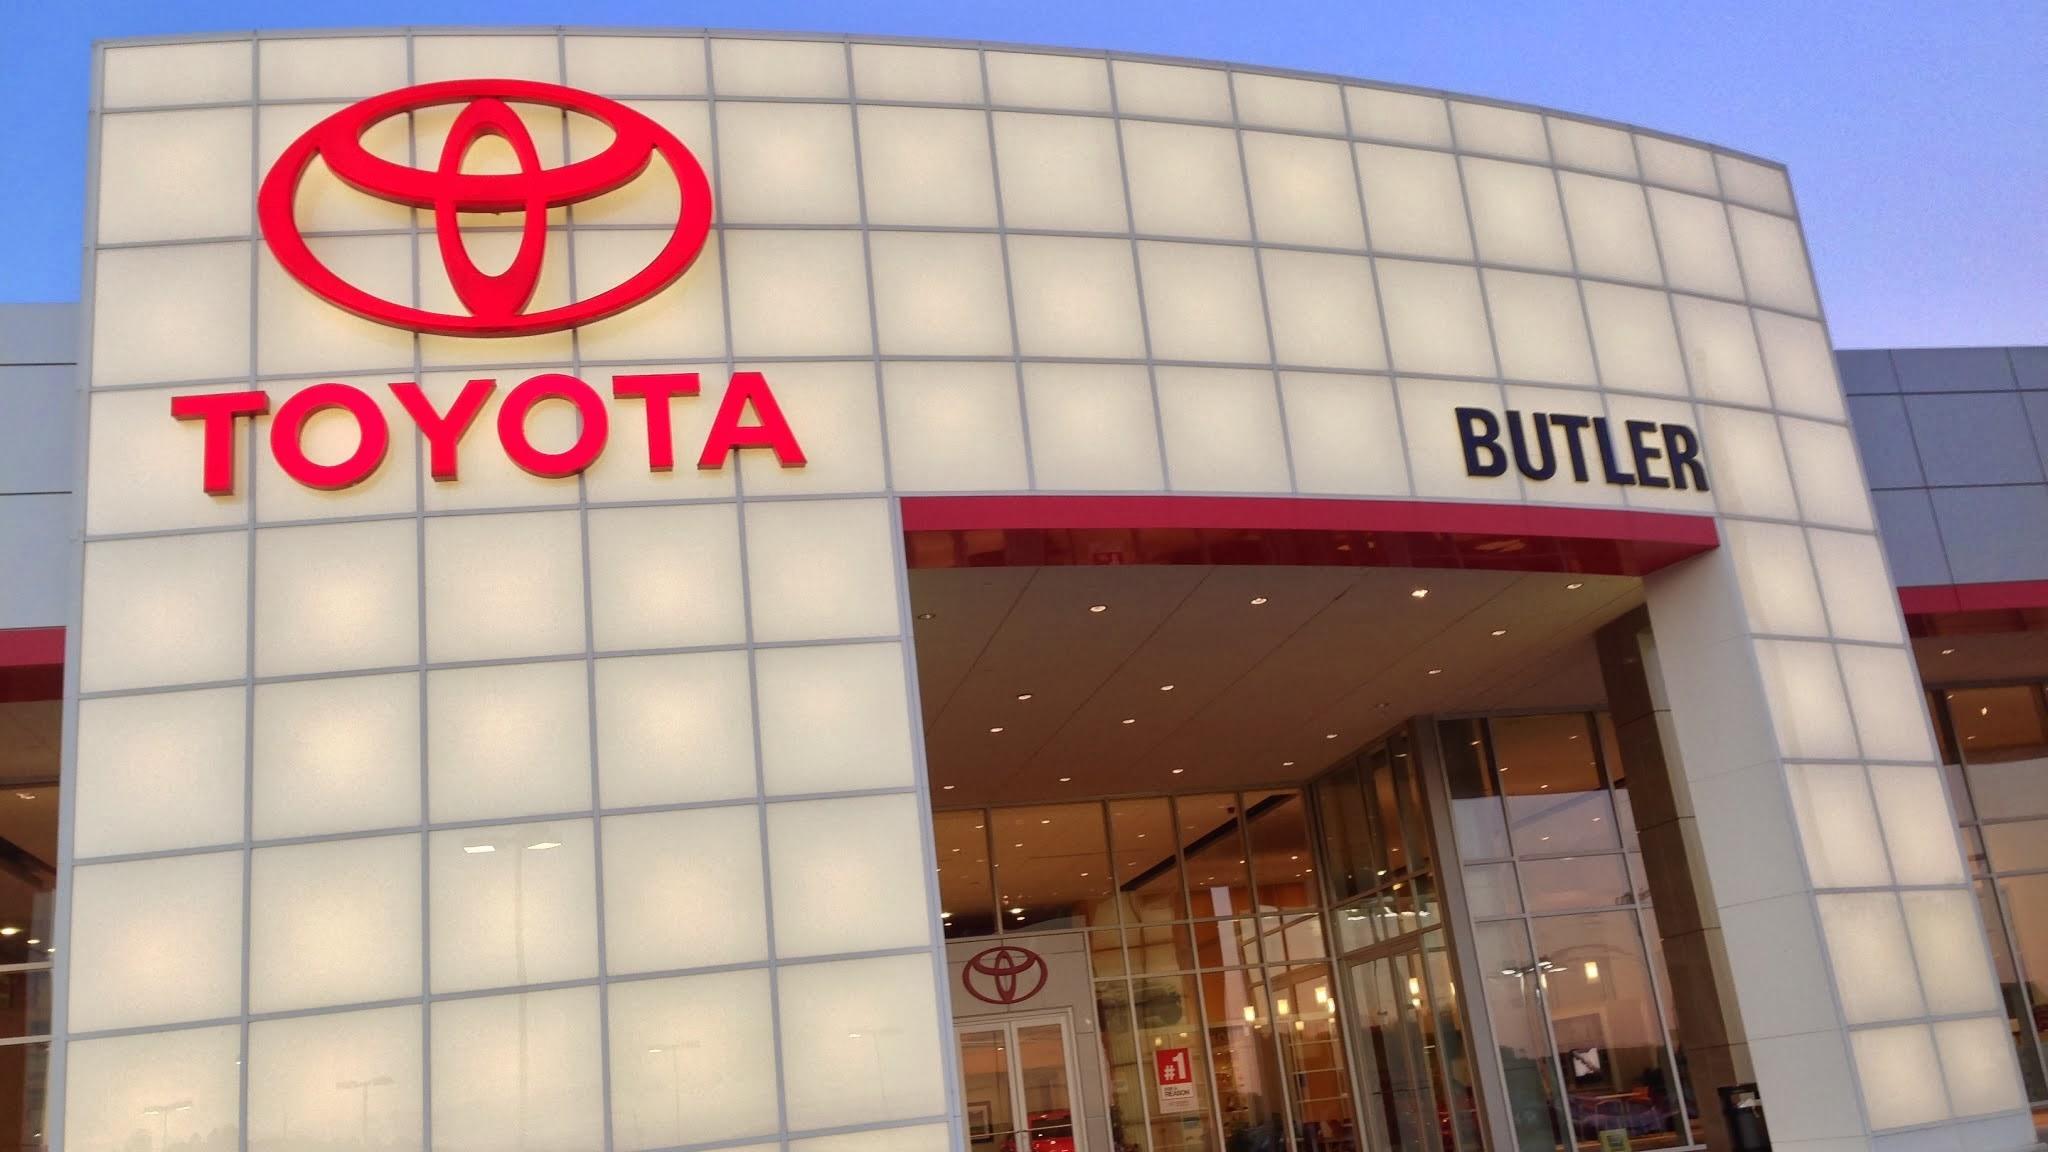 Butler Toyota Of Macon 4580 Riverside Dr Macon Ga 31210 Yp Com